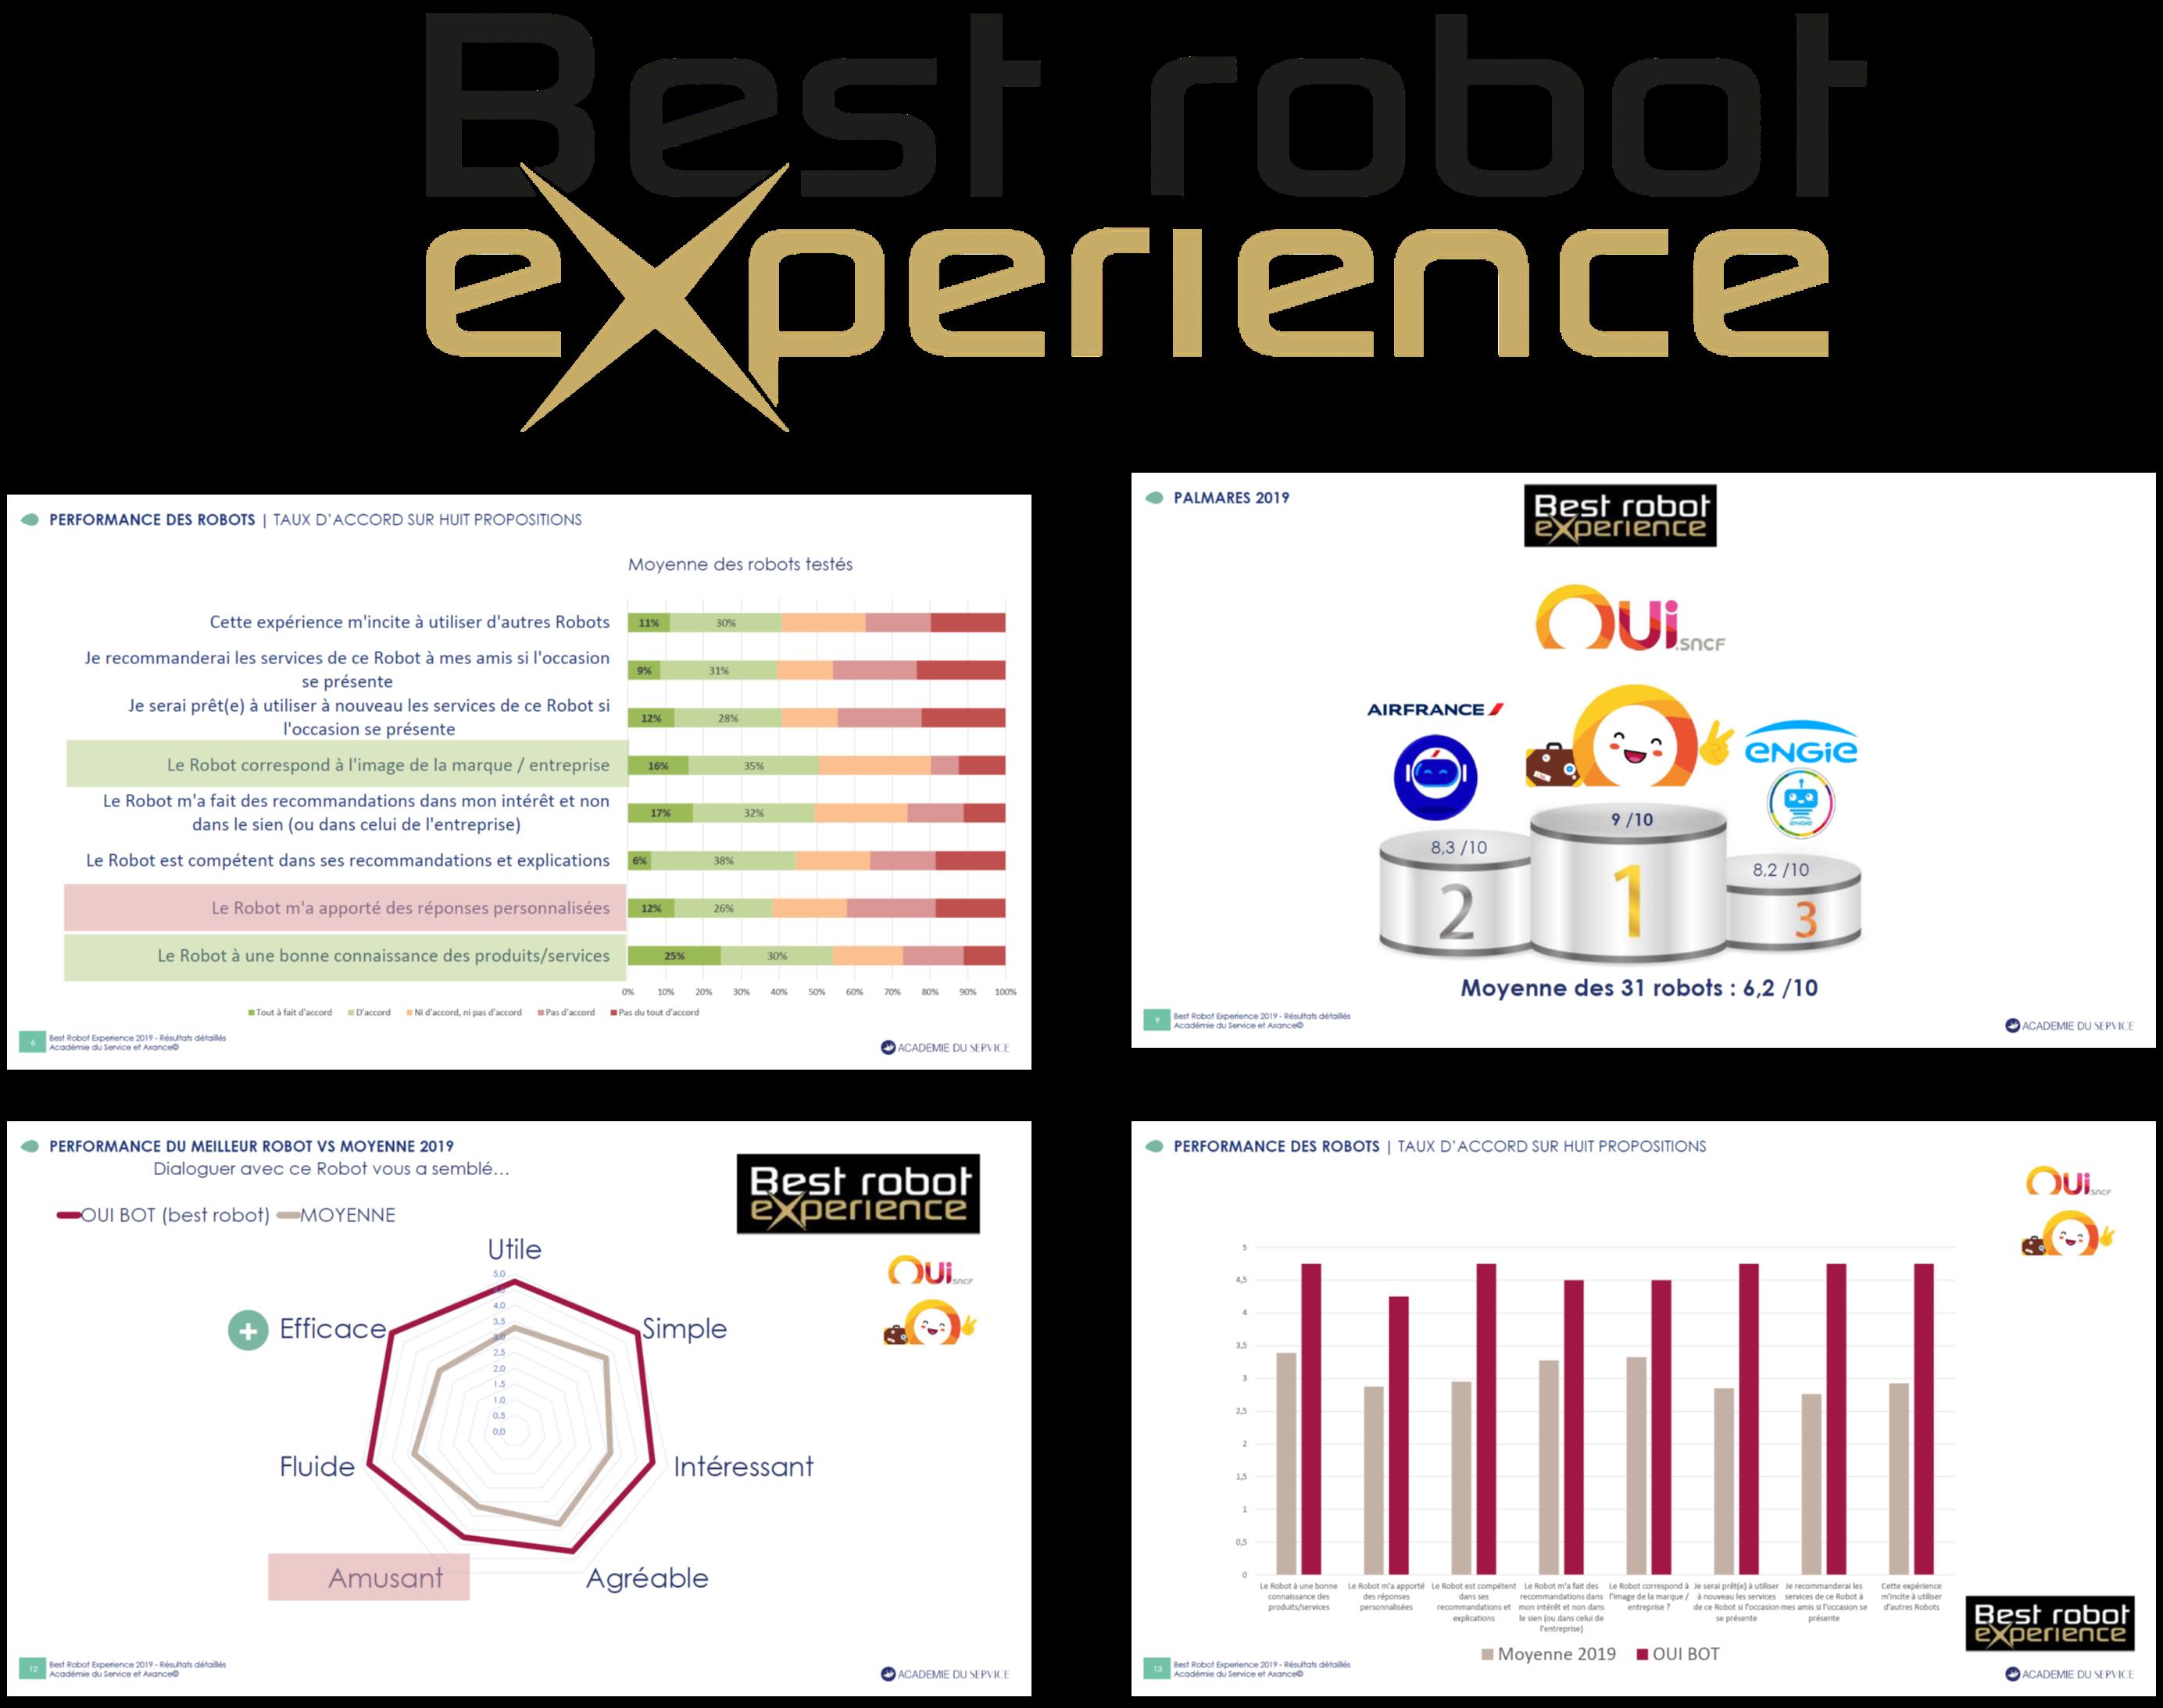 Etude Best Robot Experience